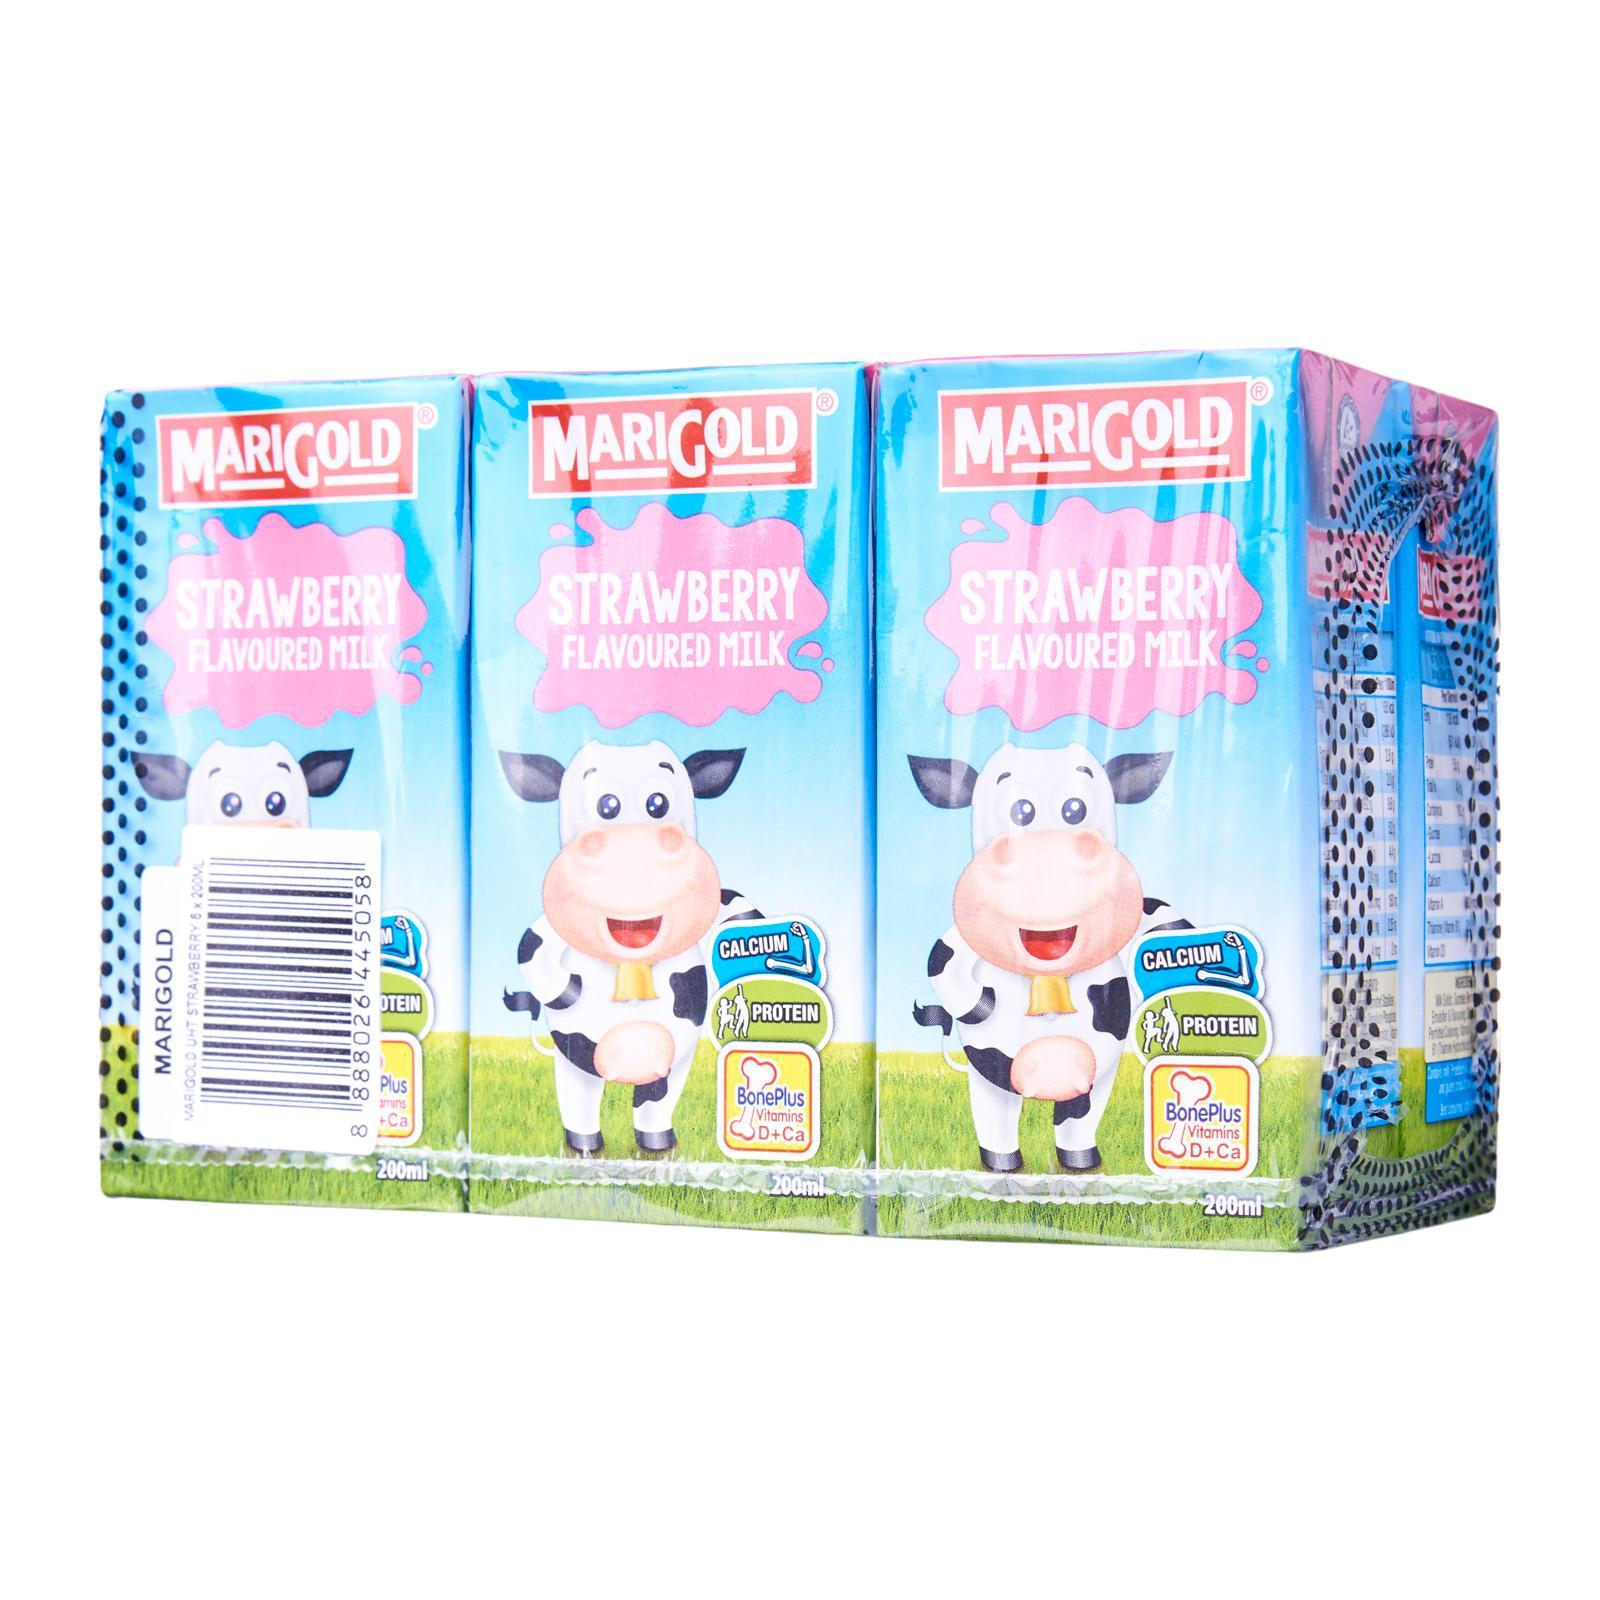 Marigold Strawberry Uht Milk By Redmart.